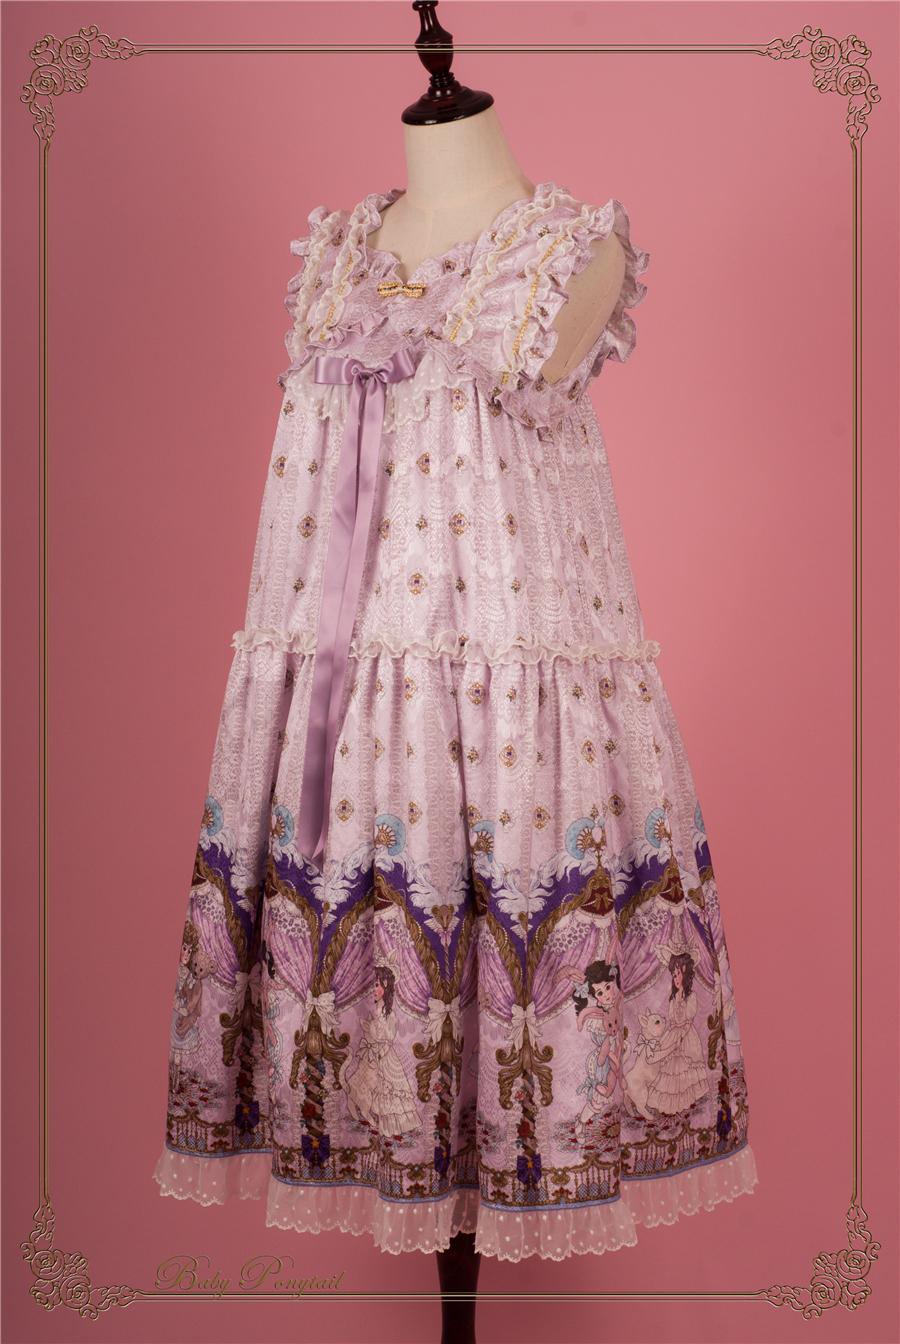 BabyPonytail_Stock Photo_My Favorite Companion_NG Lavender_4.jpg